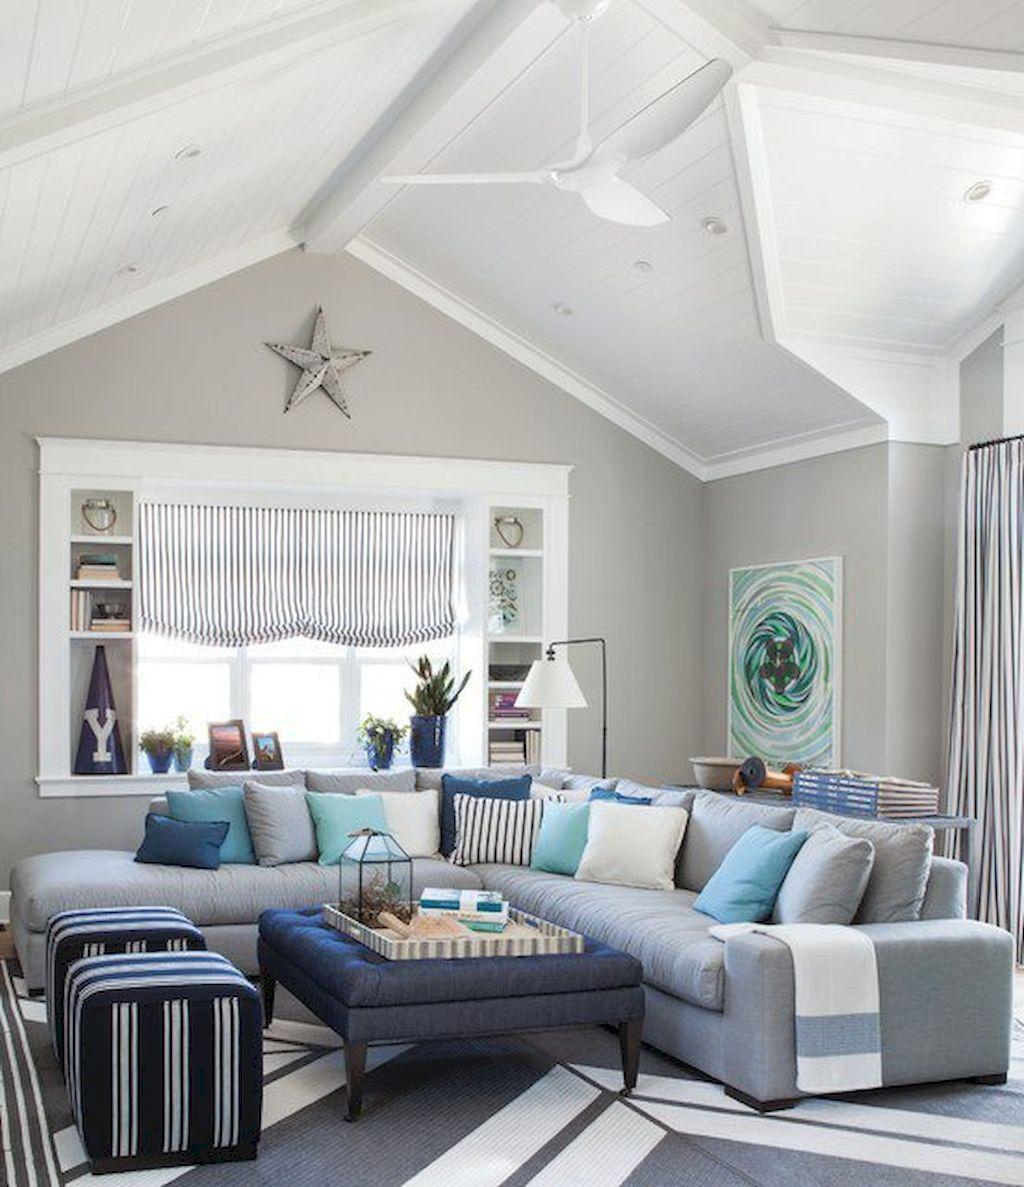 80 Inspiring Coastal Living Room Decor Ideas | Coastal living rooms ...